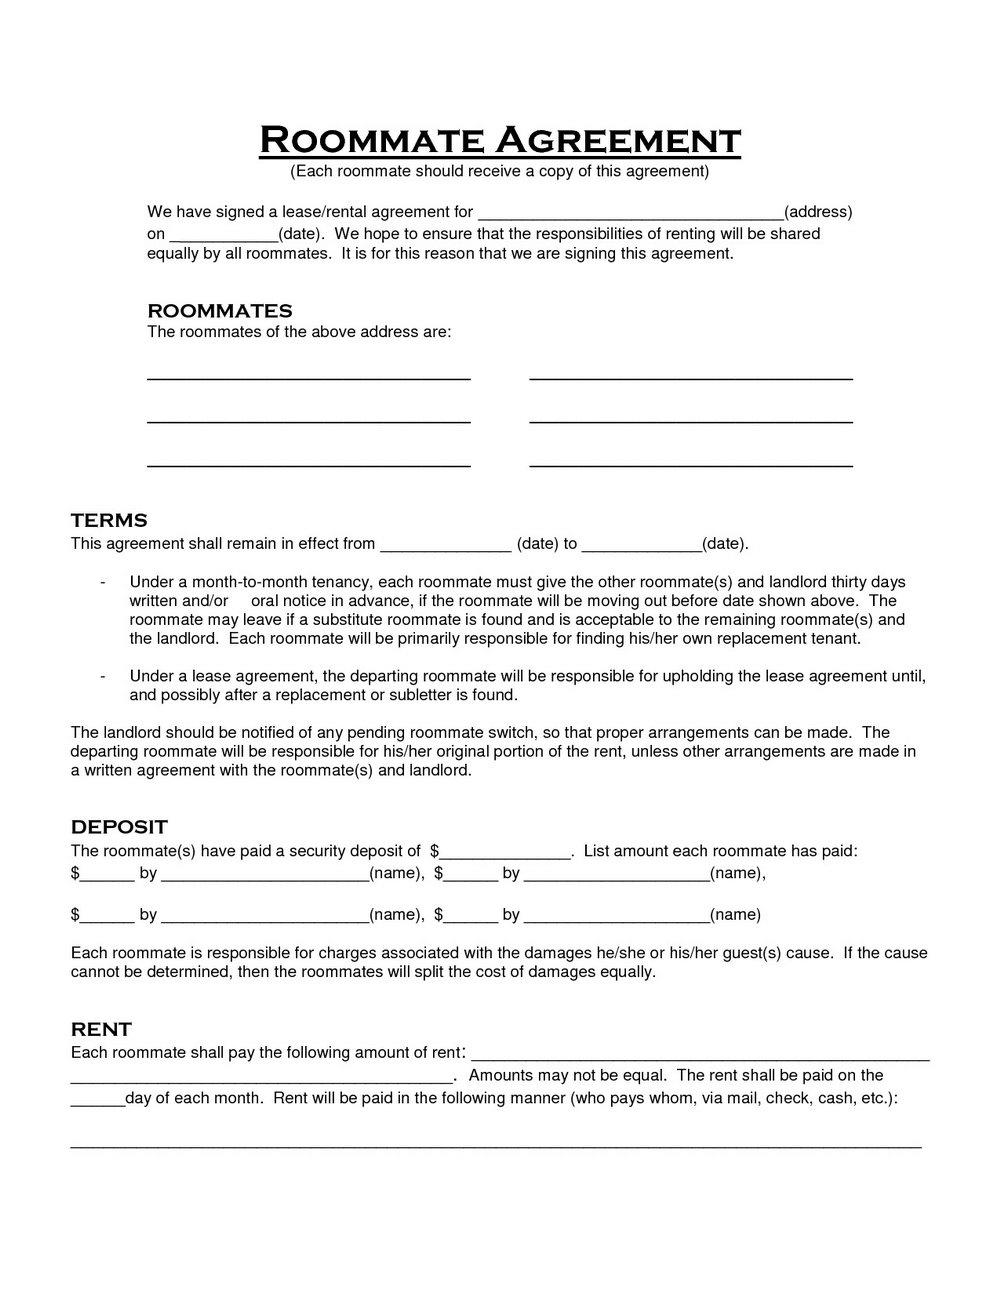 Roommate Rental Agreement Form